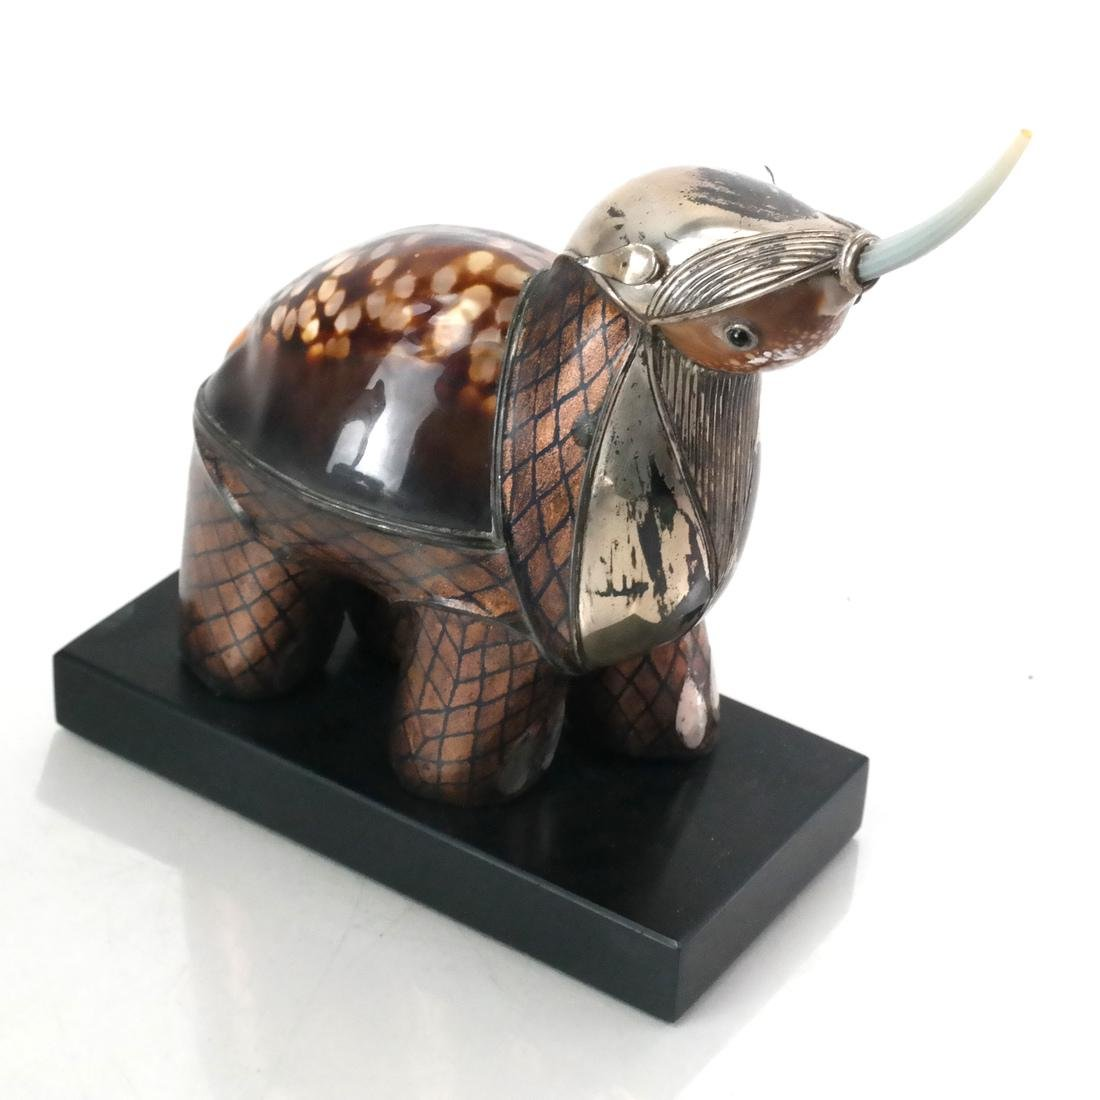 Roberto Estevez Rhino Sculpture